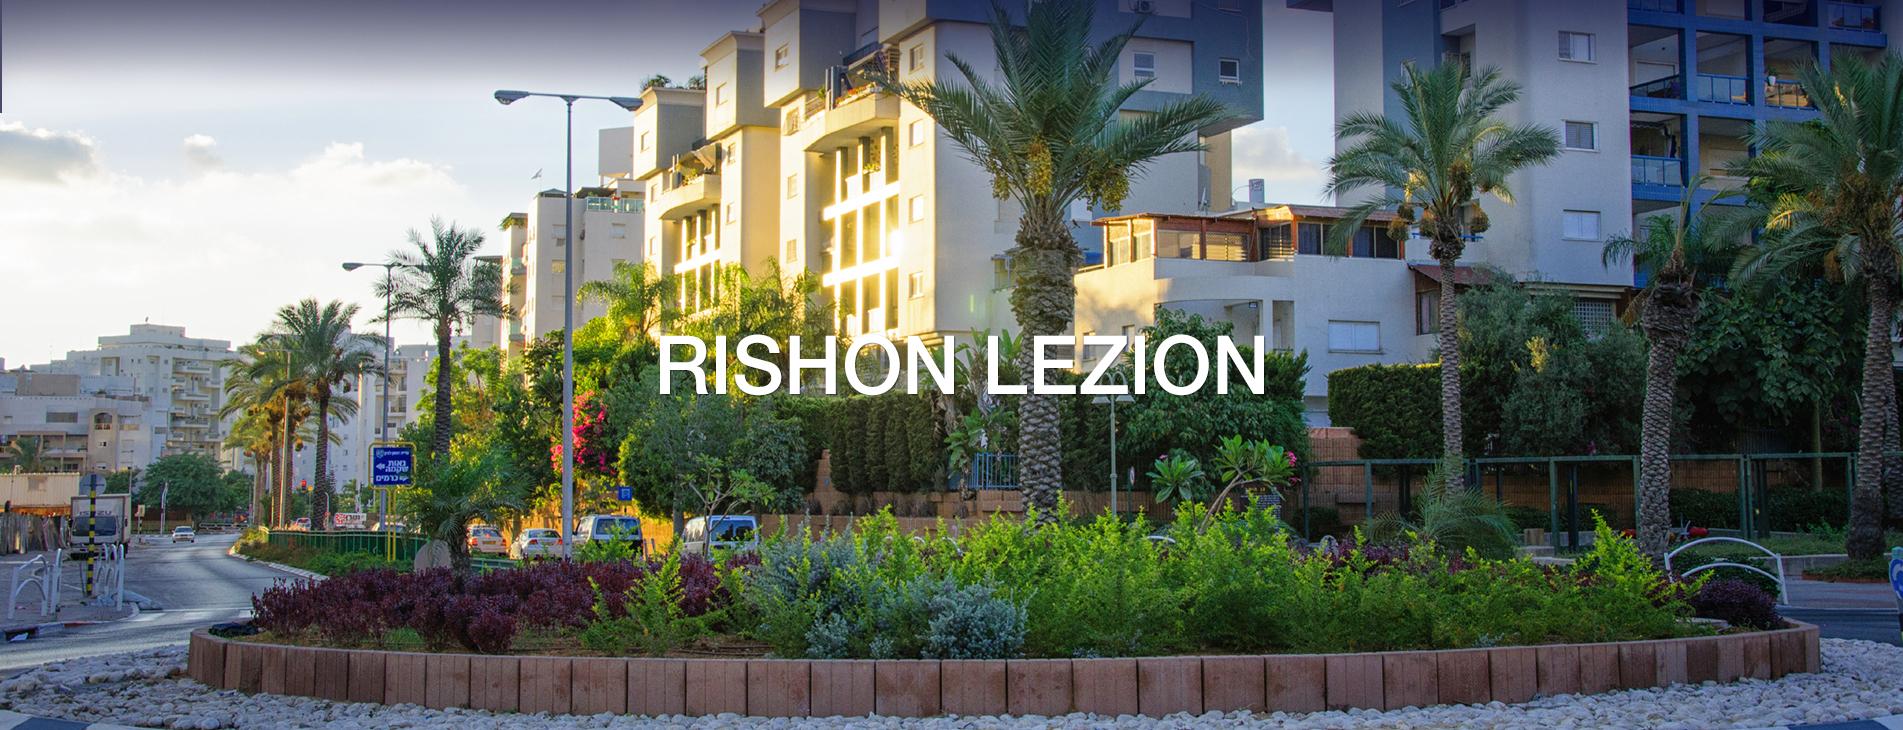 Rishon-Letsion2